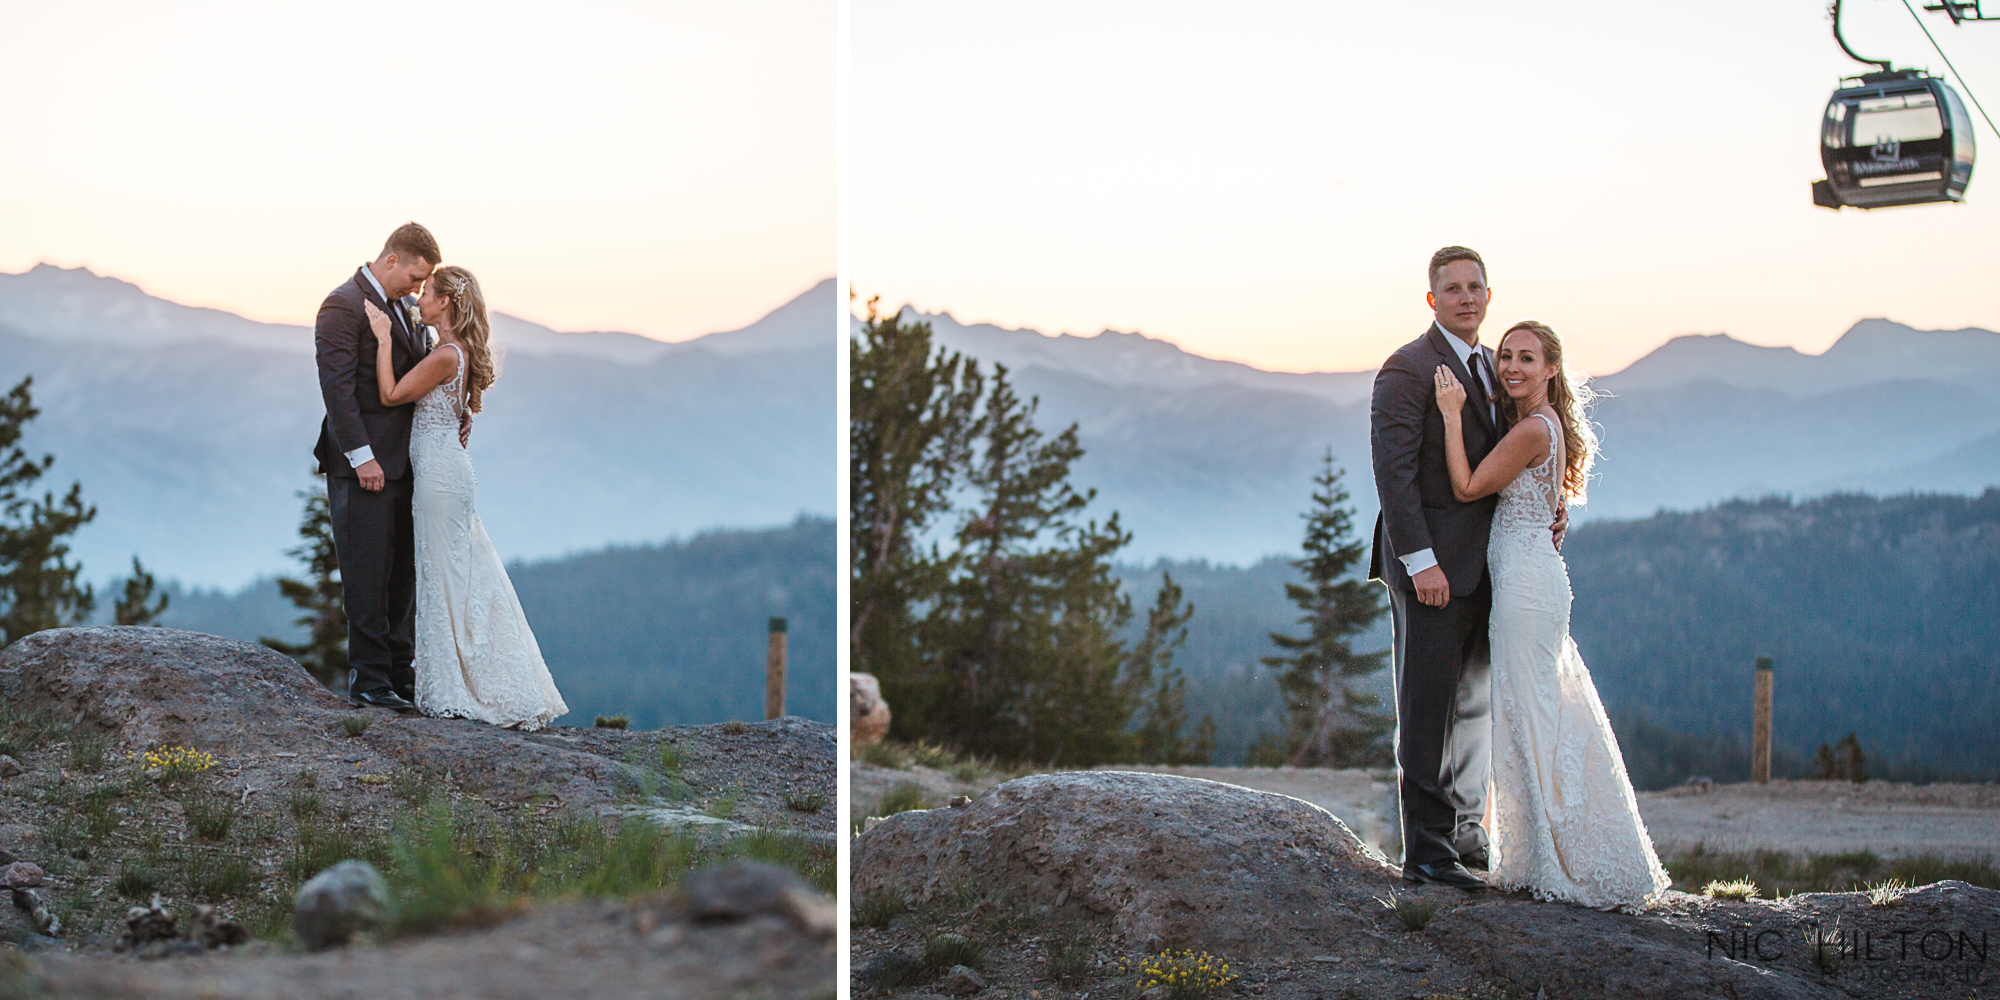 Mammoth-Mountain-Bride-and-groom-photography.jpg